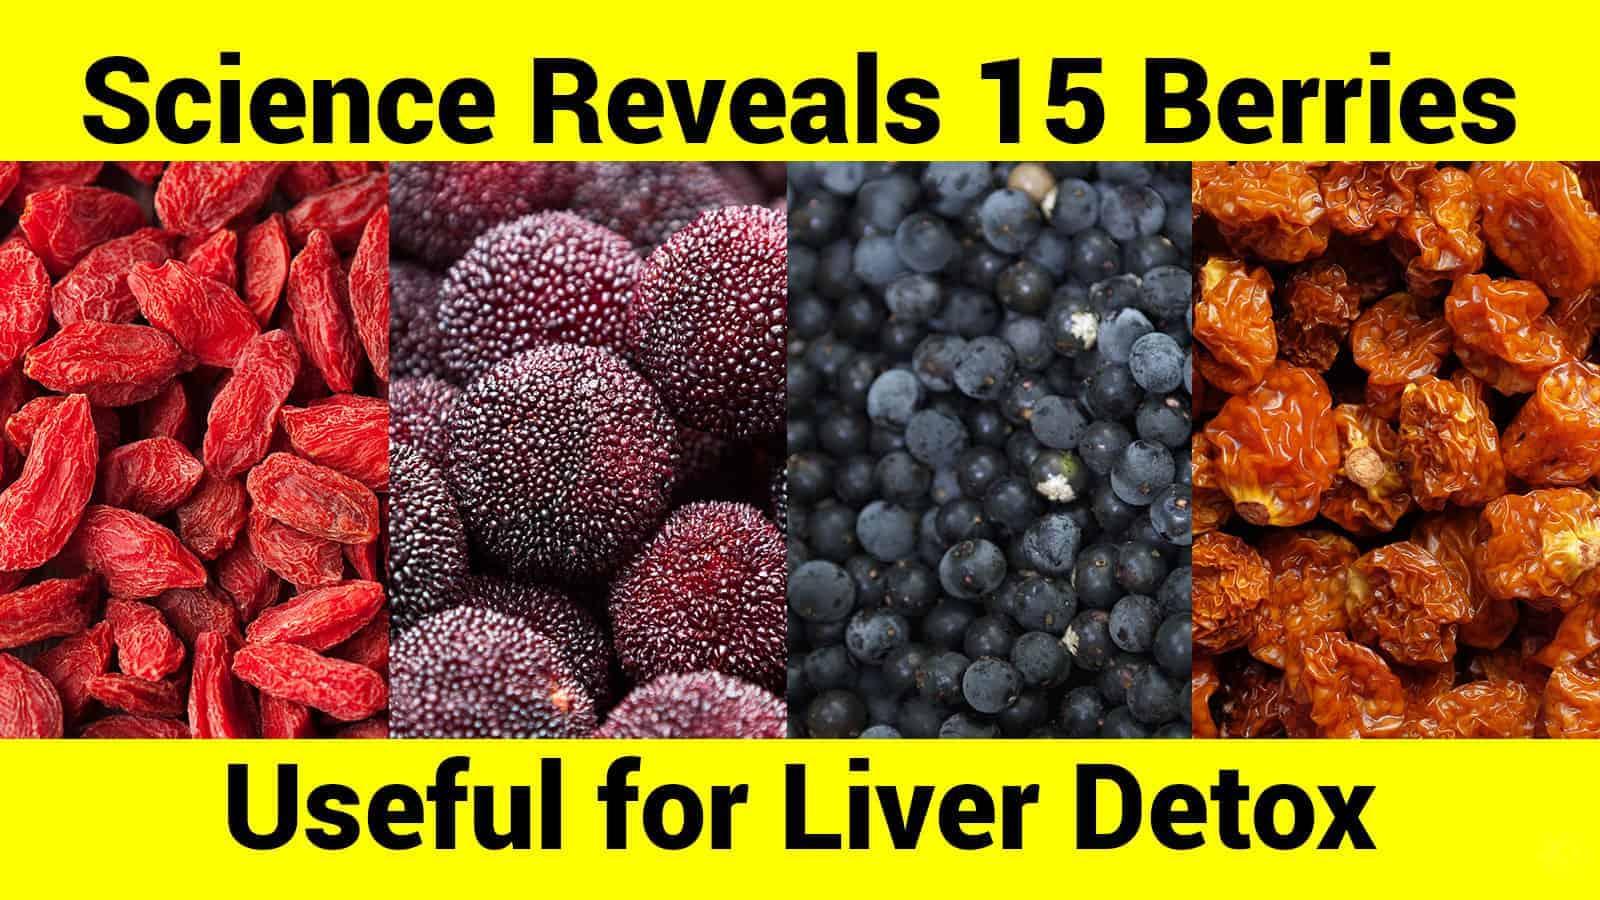 liver detox